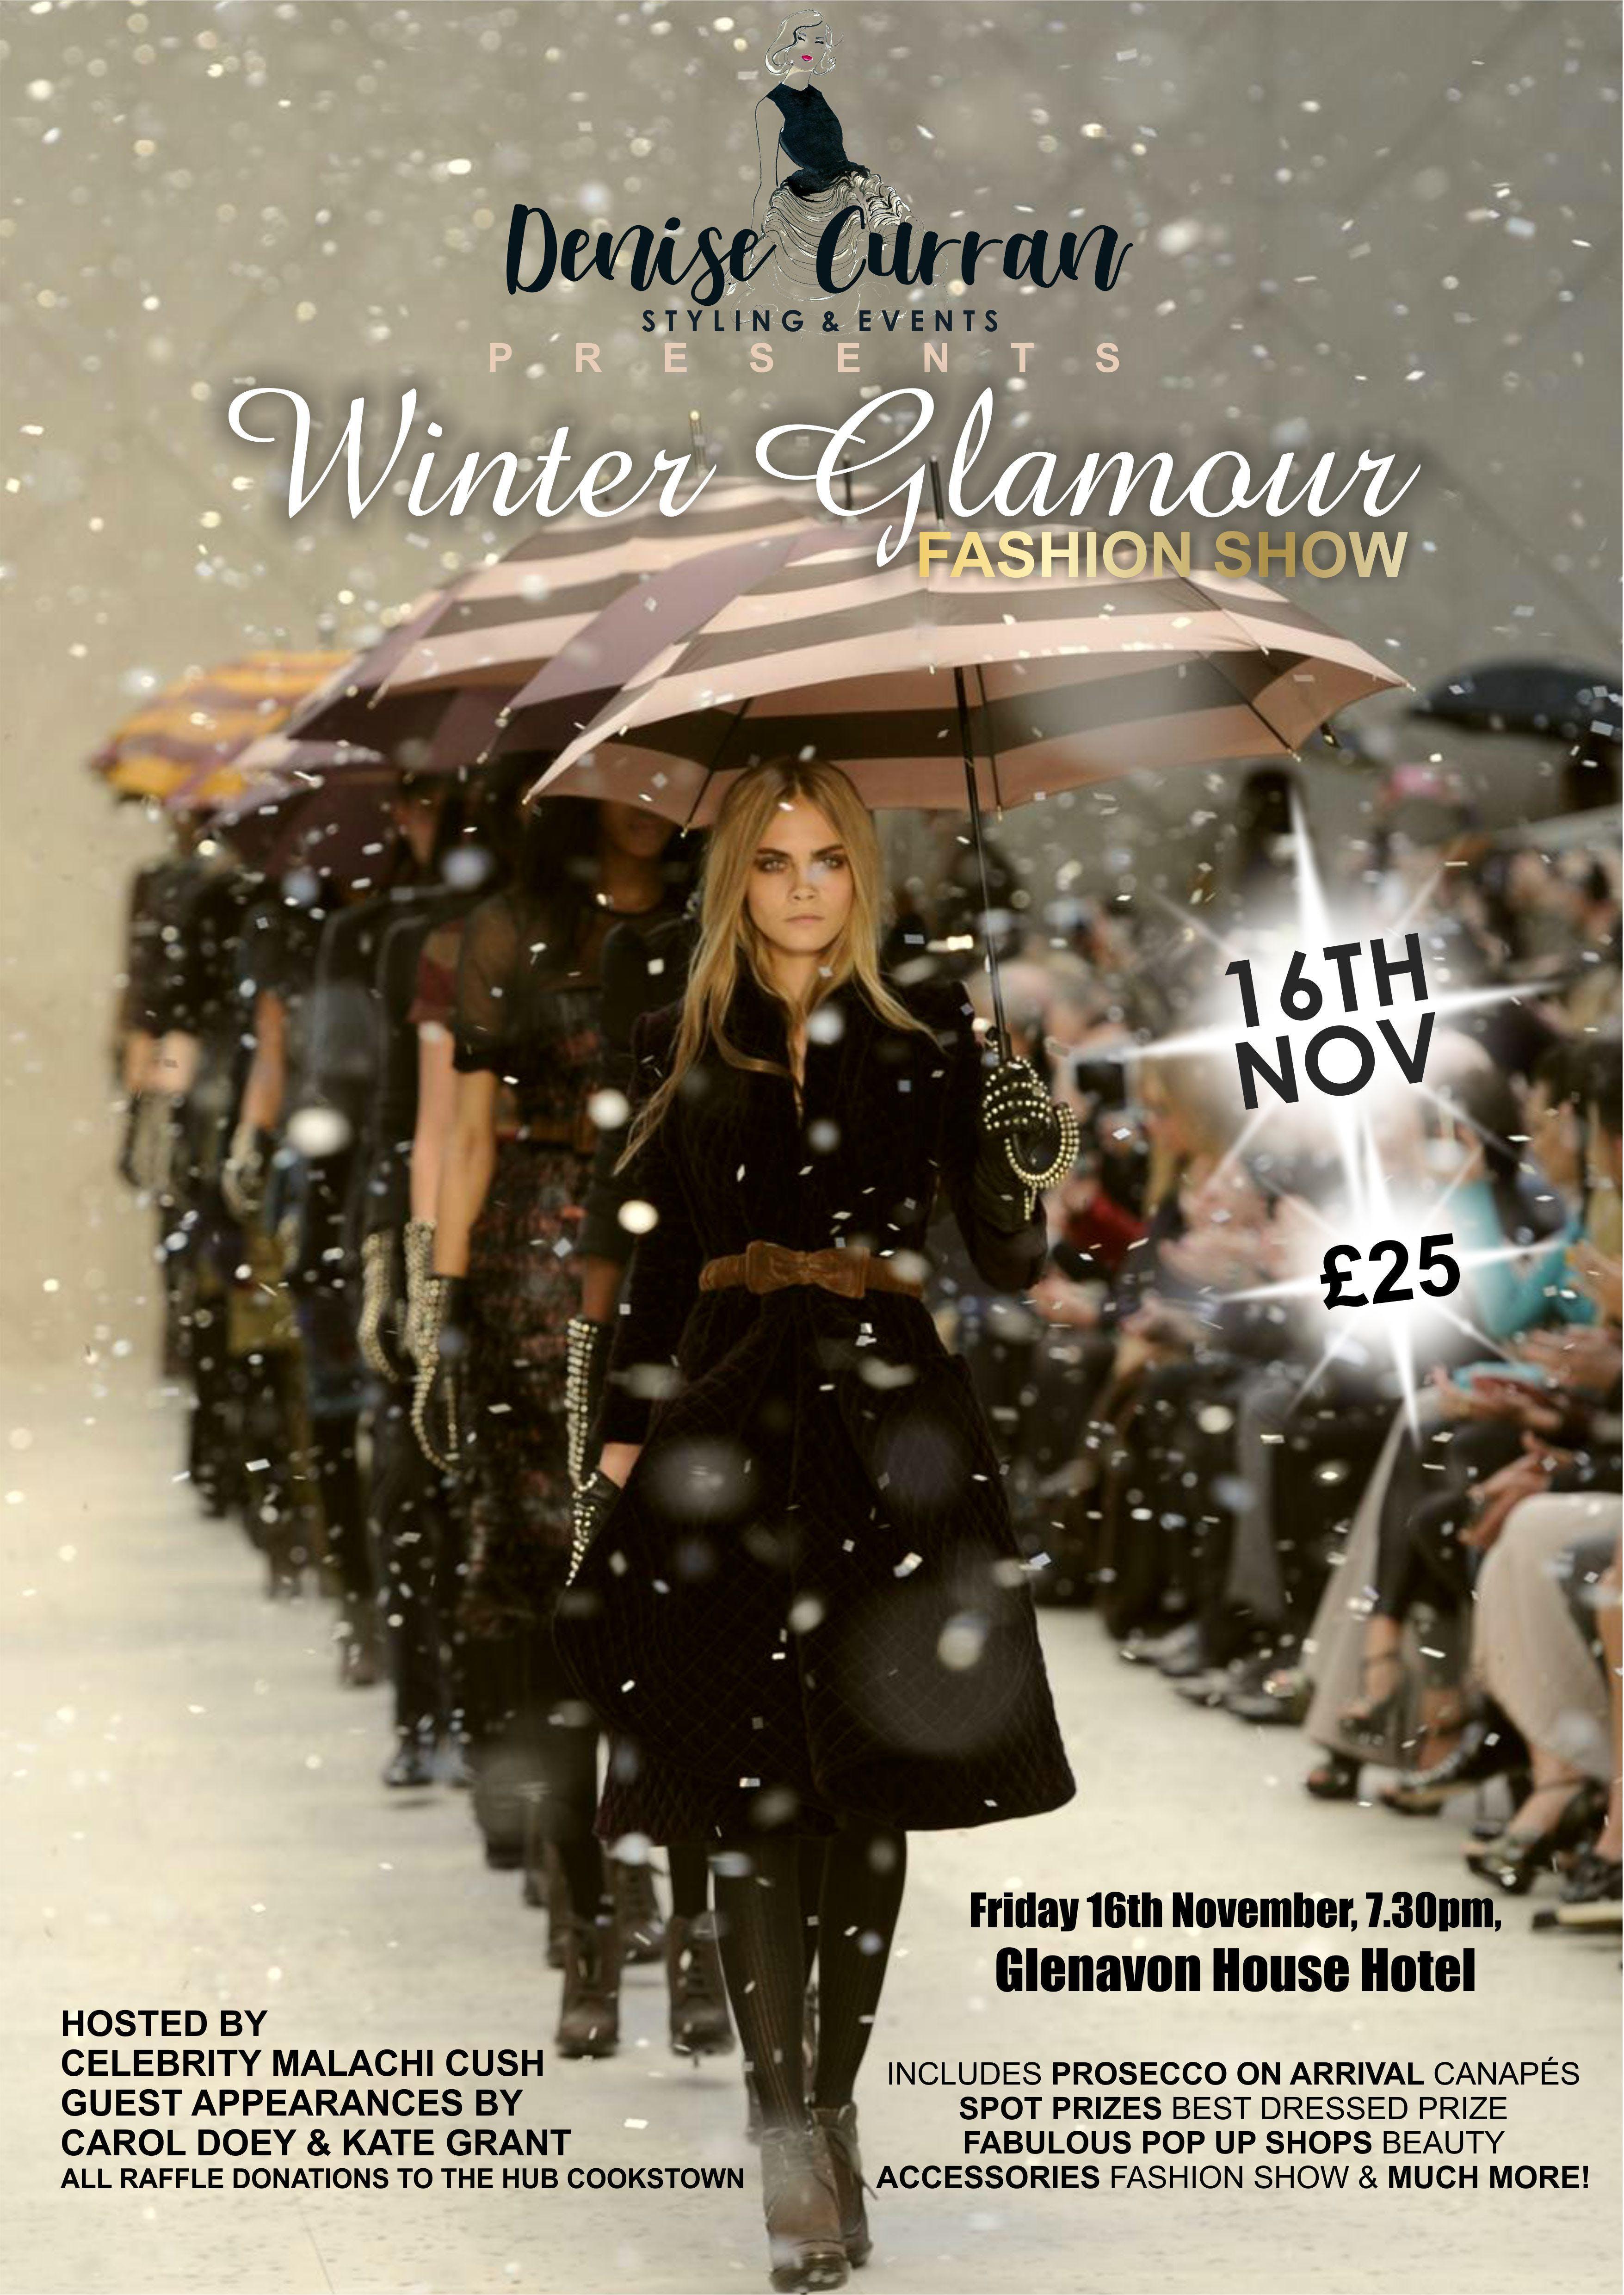 Denise Curran Winter Glamour Fashion Show at Glenavon Hotel